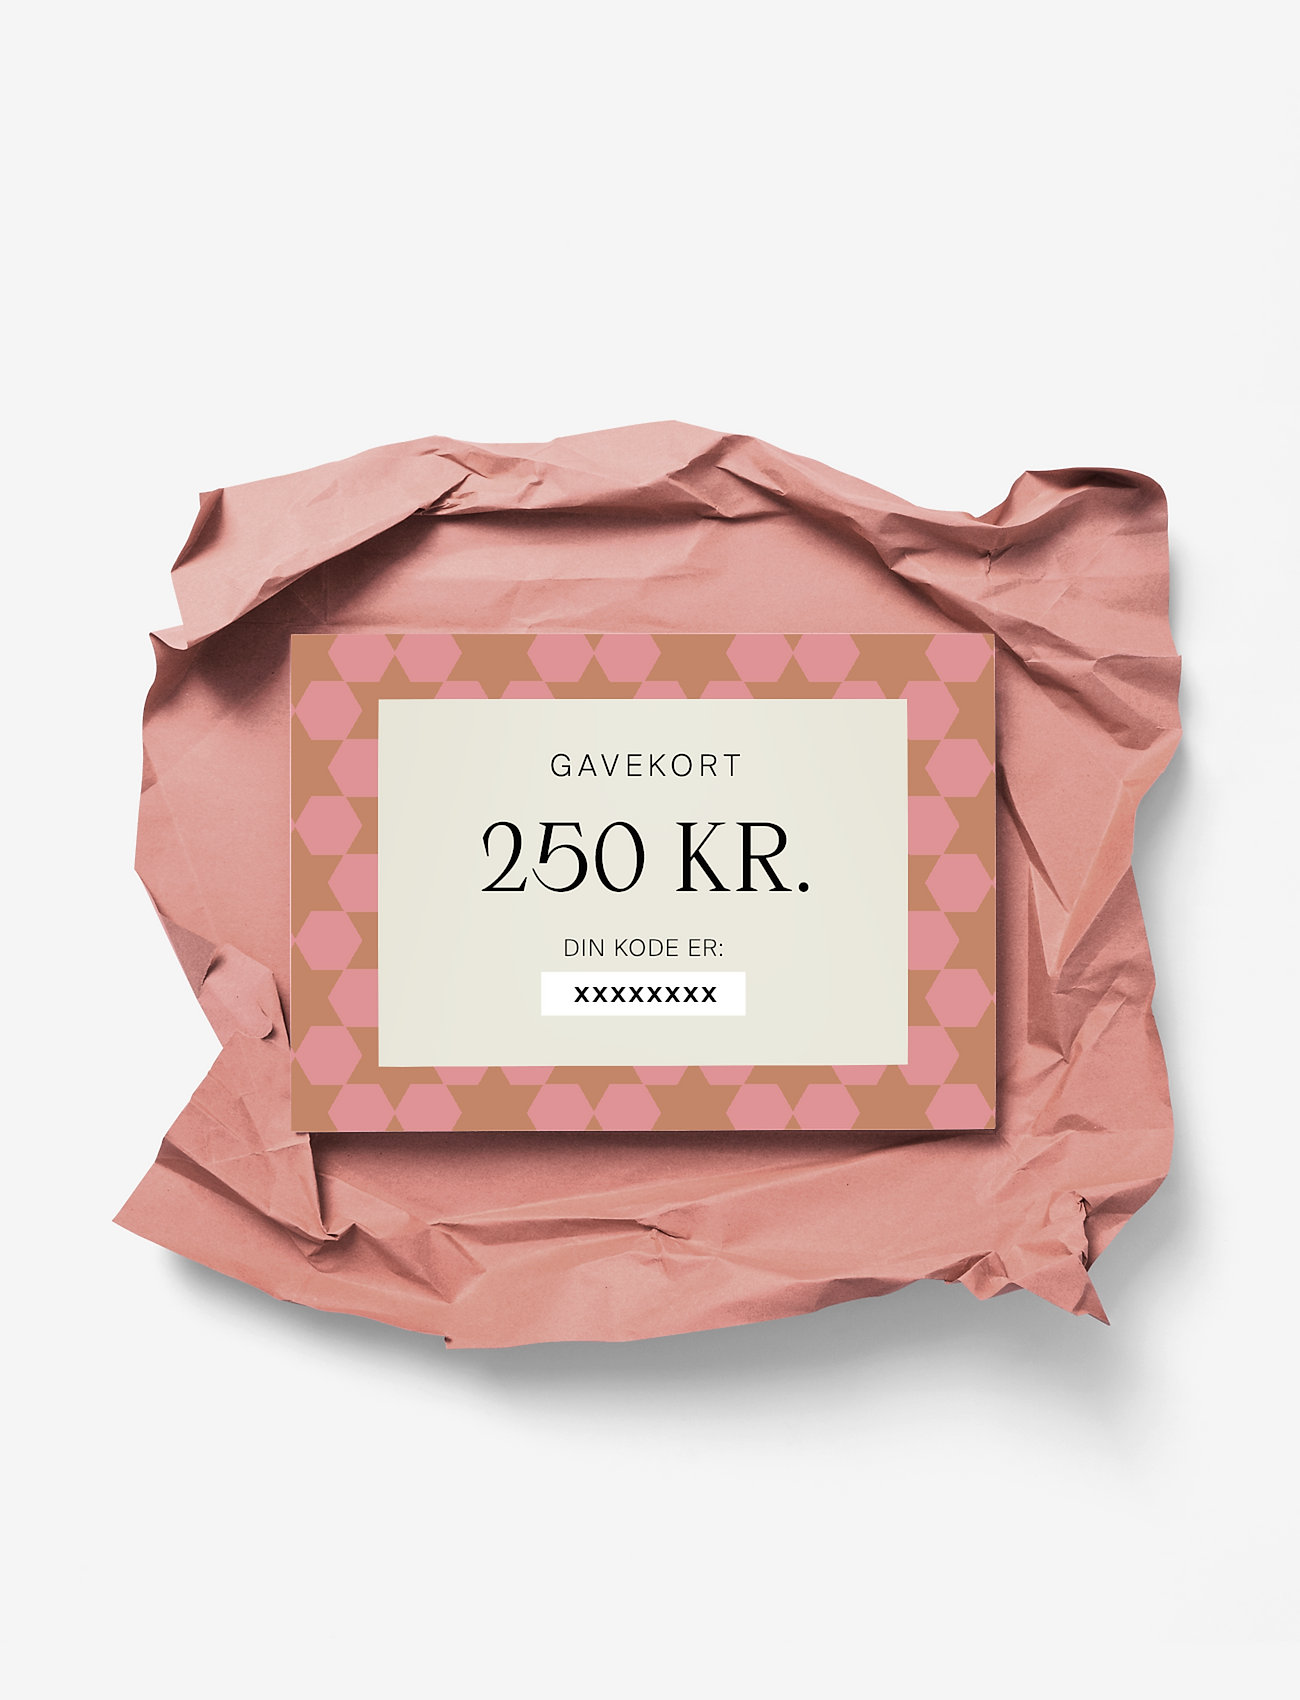 Boozt Gift - Gift card - dāvanu kartes - dkk 250 - 0